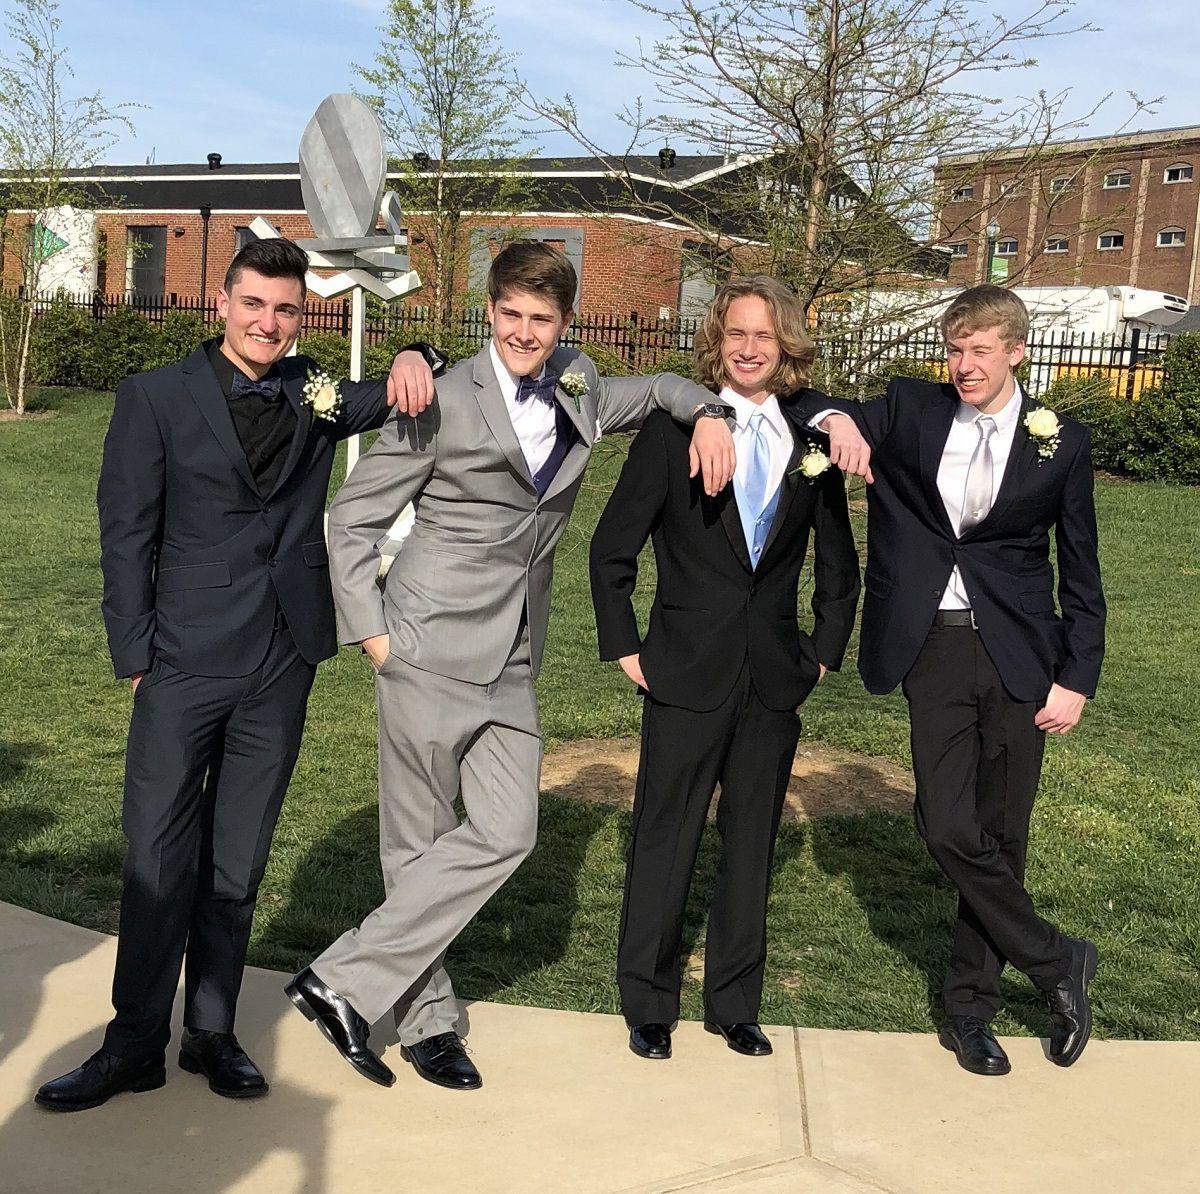 Prom 2018: Daniel Boone High School (Part 2)